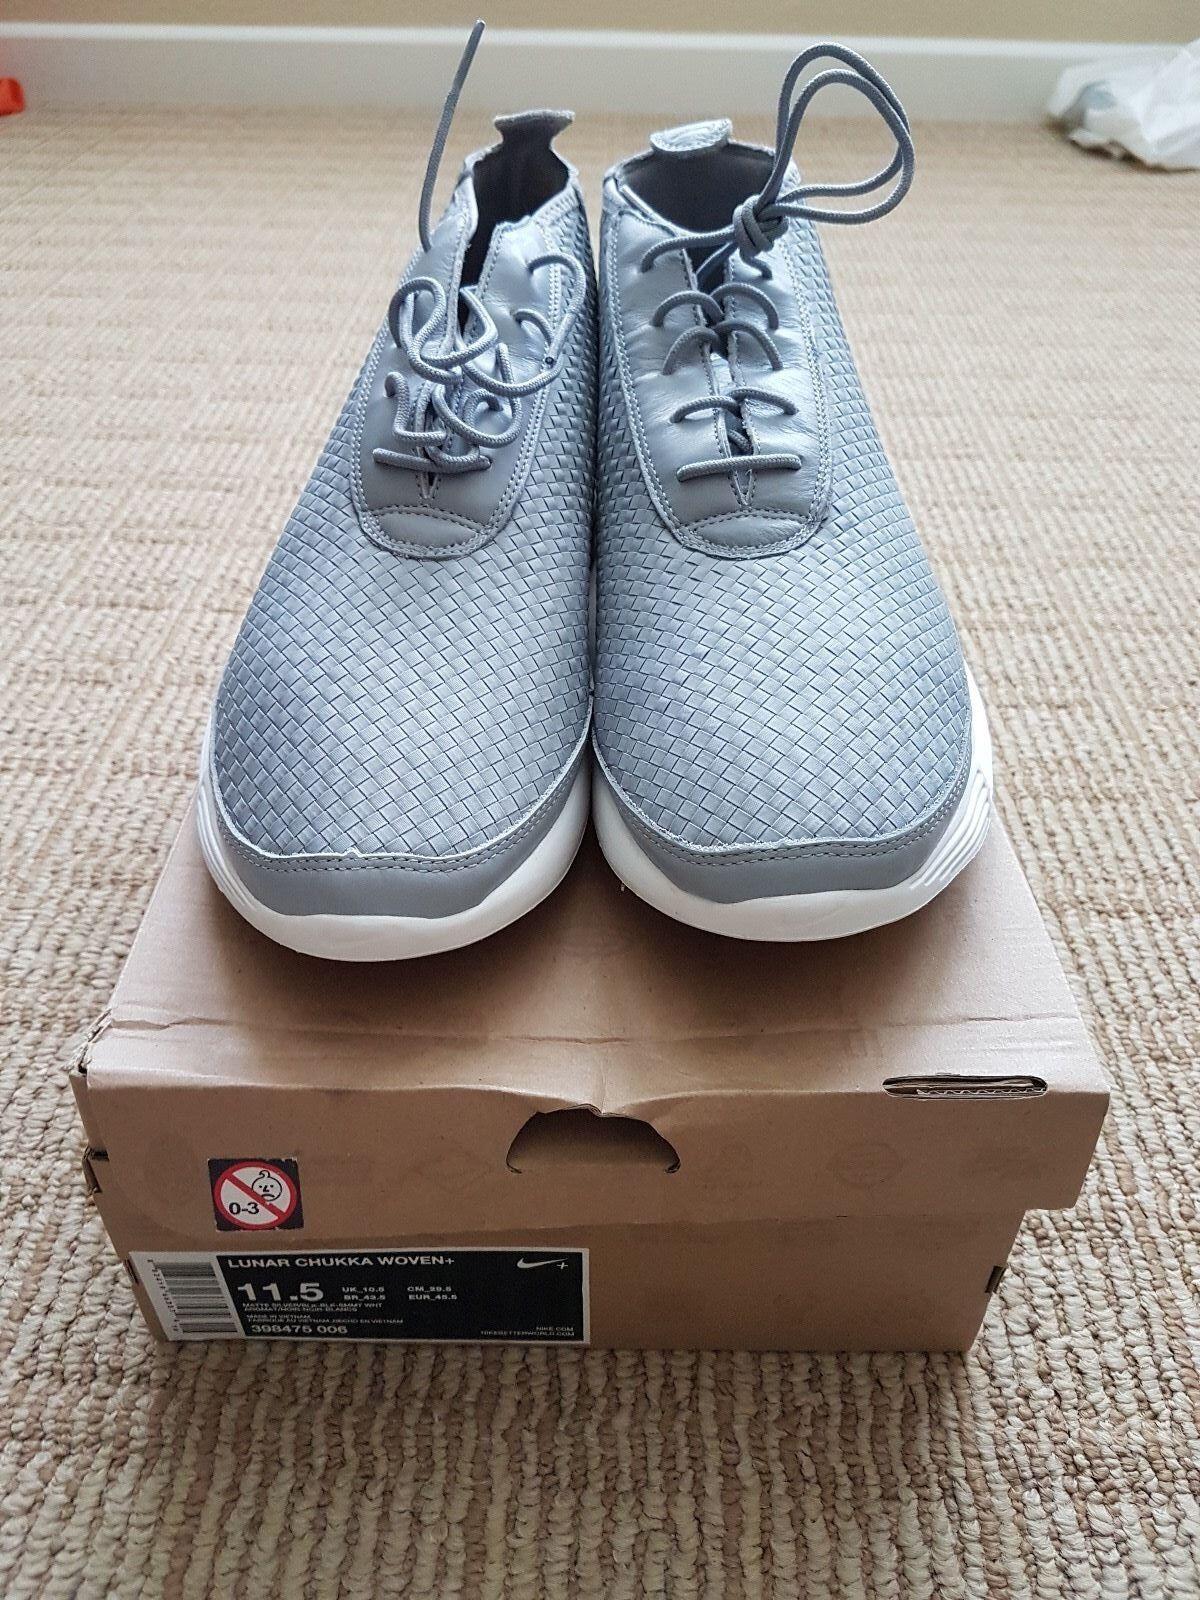 huge discount 4918a 68bf9 Nike lunar - - - chukka tessuti + sz 11,5 opaca bianco argento